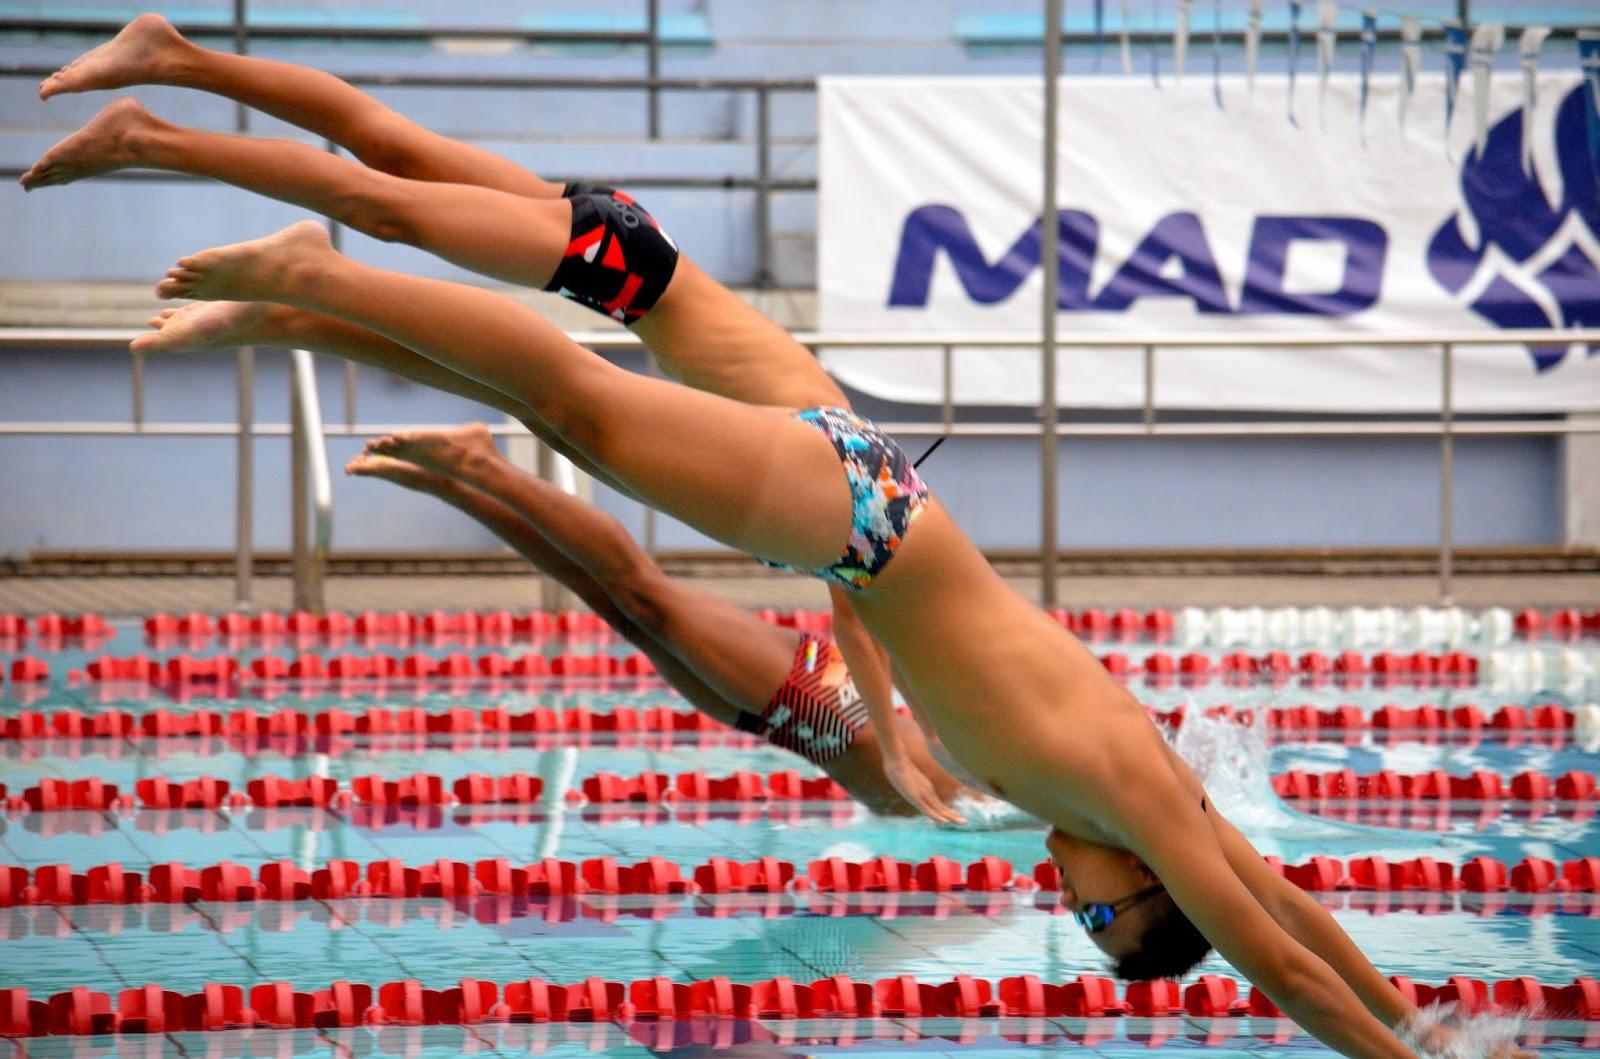 Ikan Bilis Swimming Club 1971 Kl February 2015